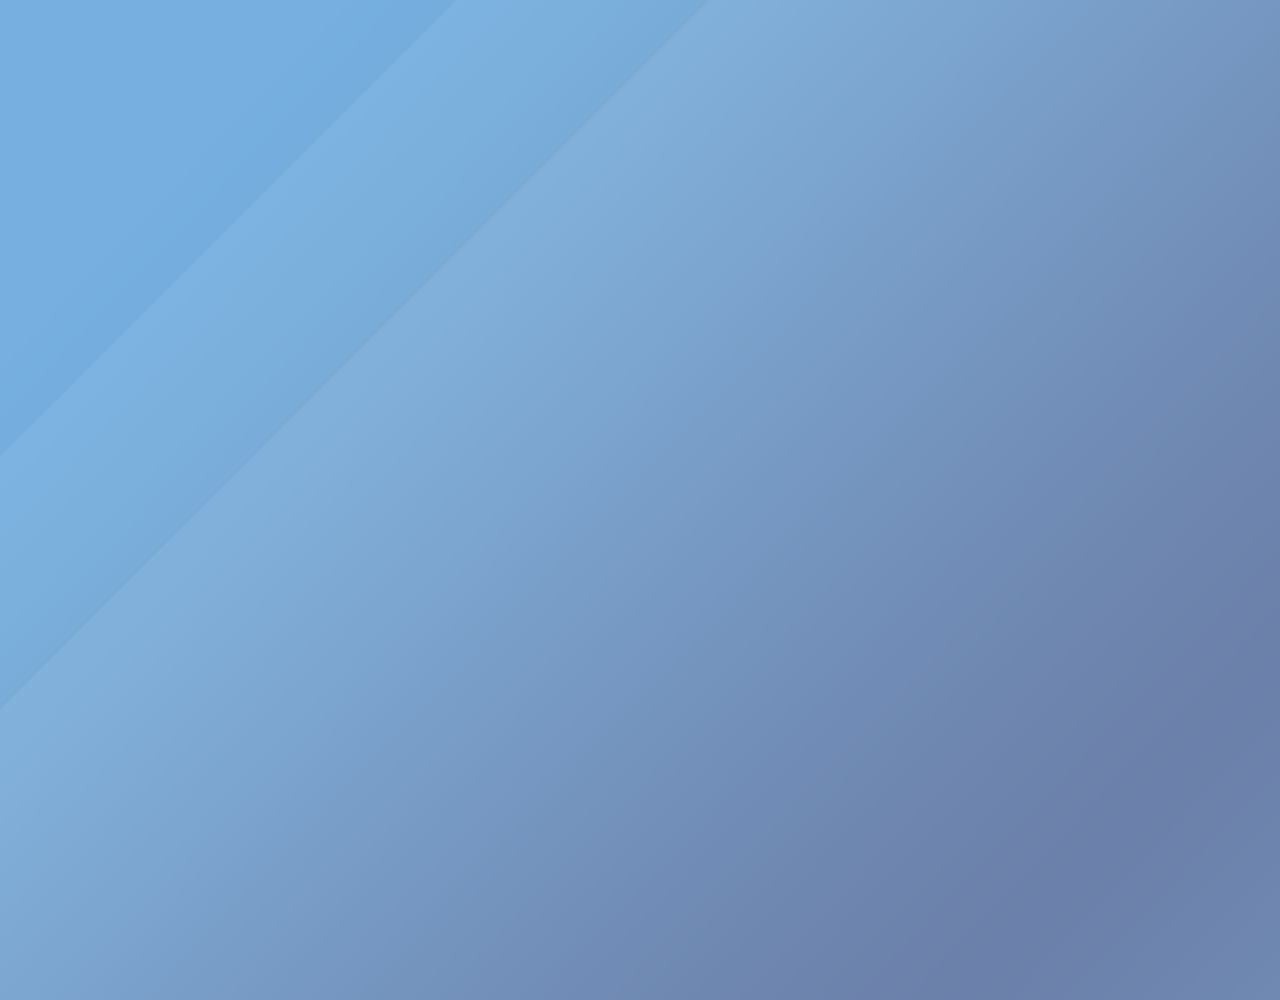 bg-blue-2.png